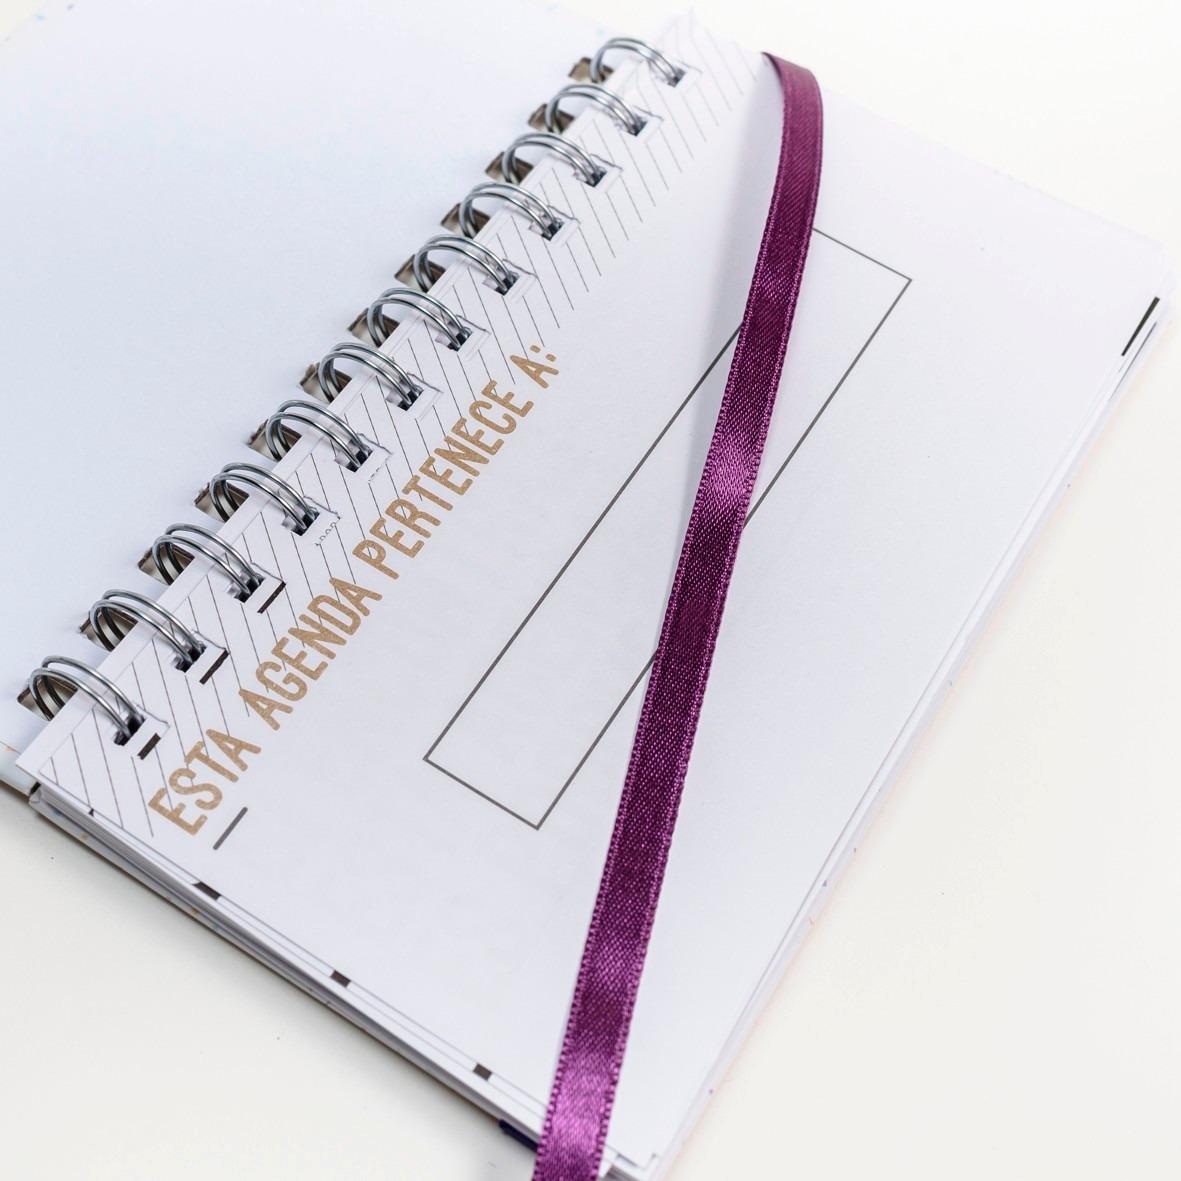 Agenda 2017 pocket mamushka positivo design cargando zoom